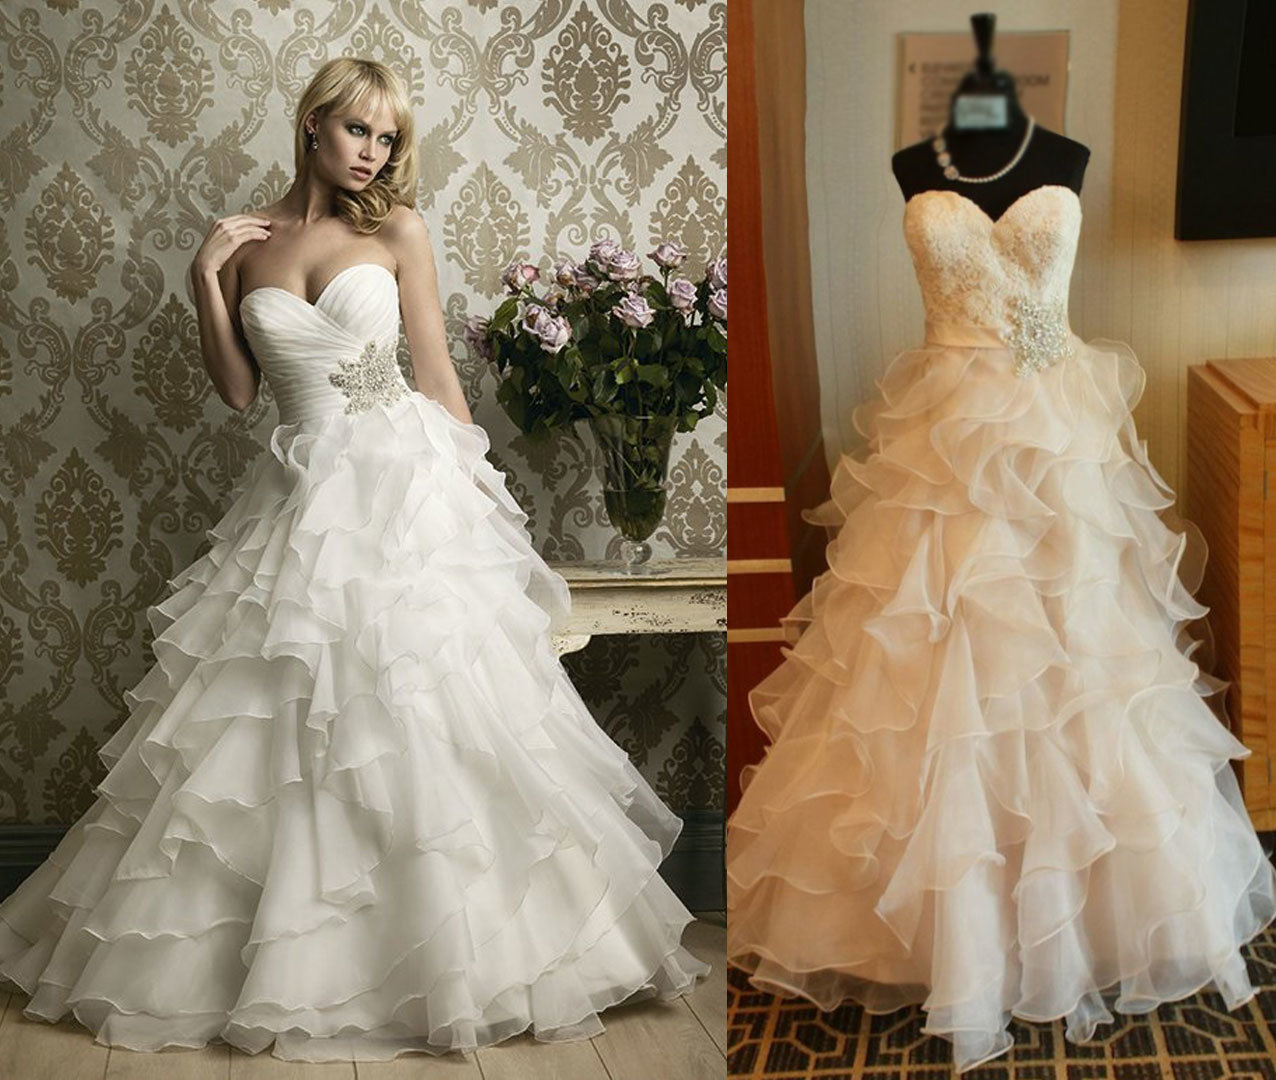 Ruffles Bottom Sweetheart Wedding Dress with Belt